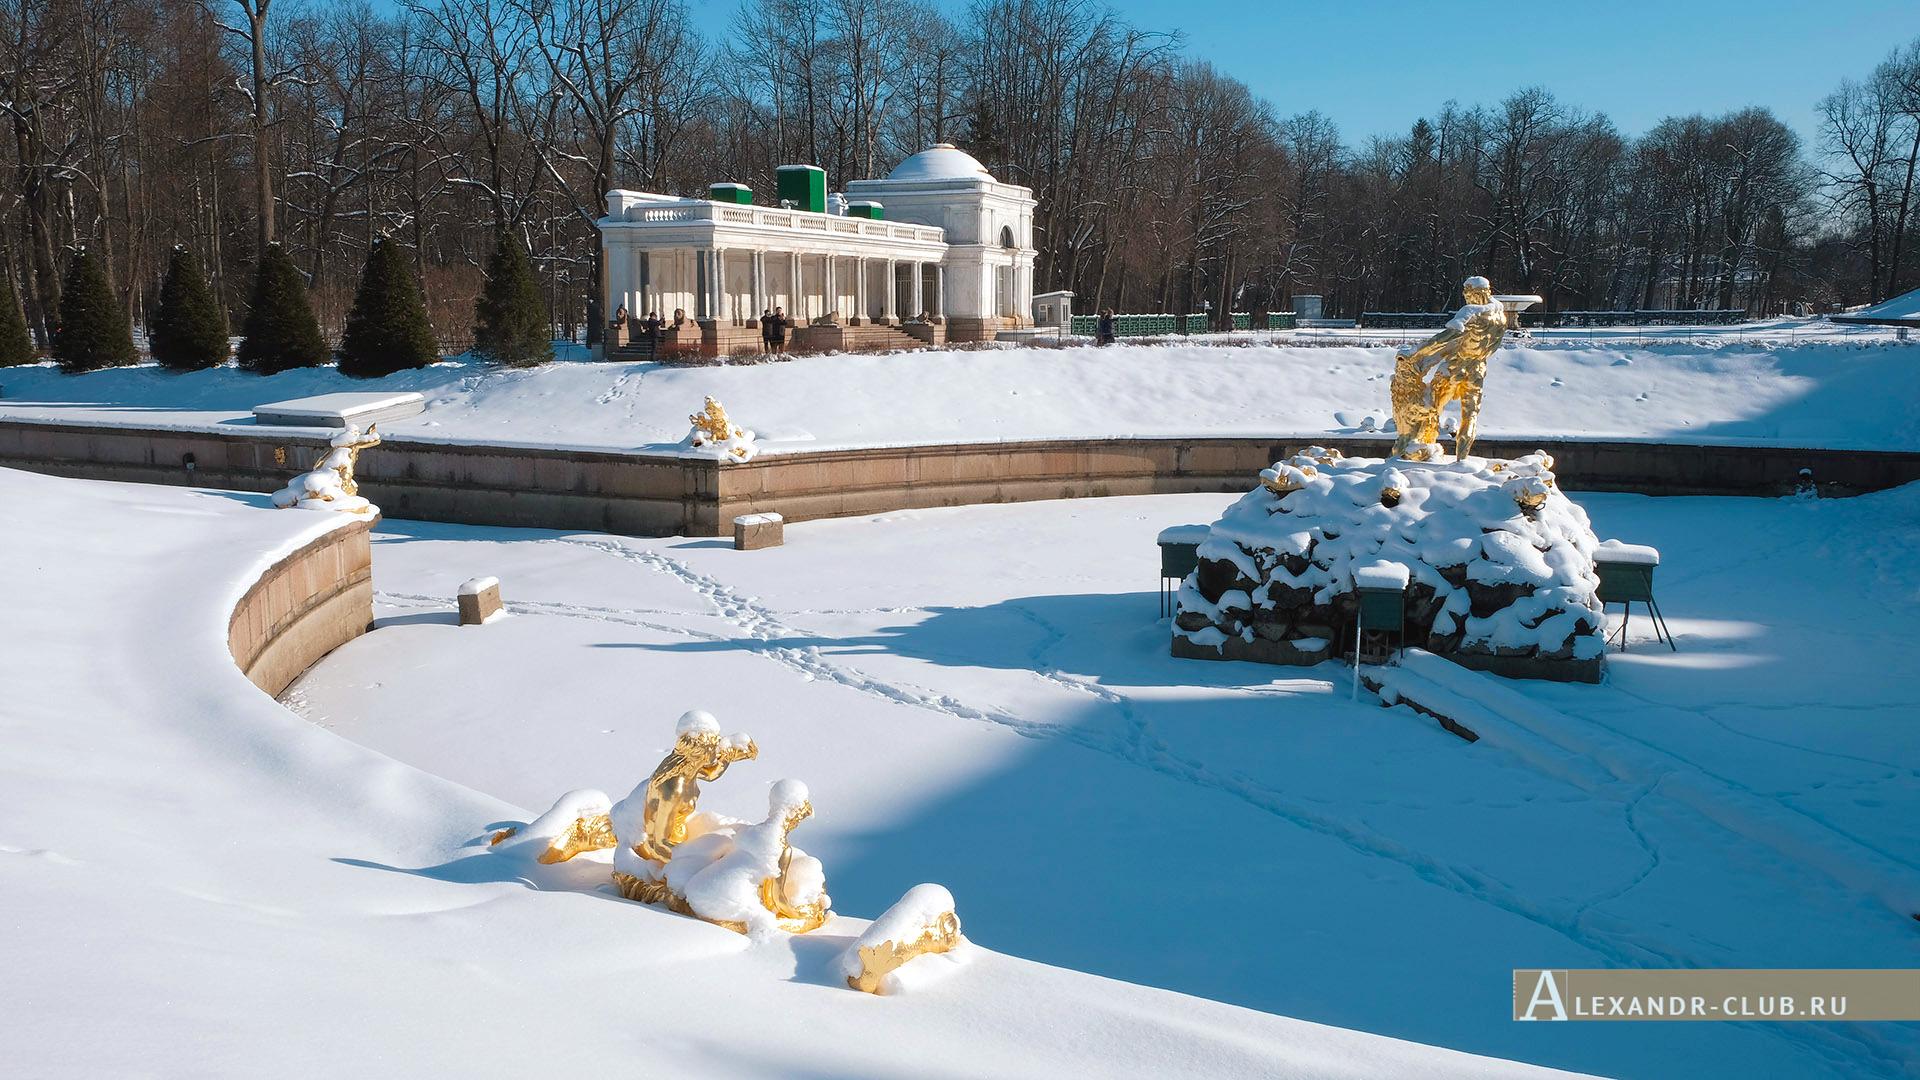 Петергоф, зима, Нижний парк, фонтан «Самсон» и Воронихинская колоннада